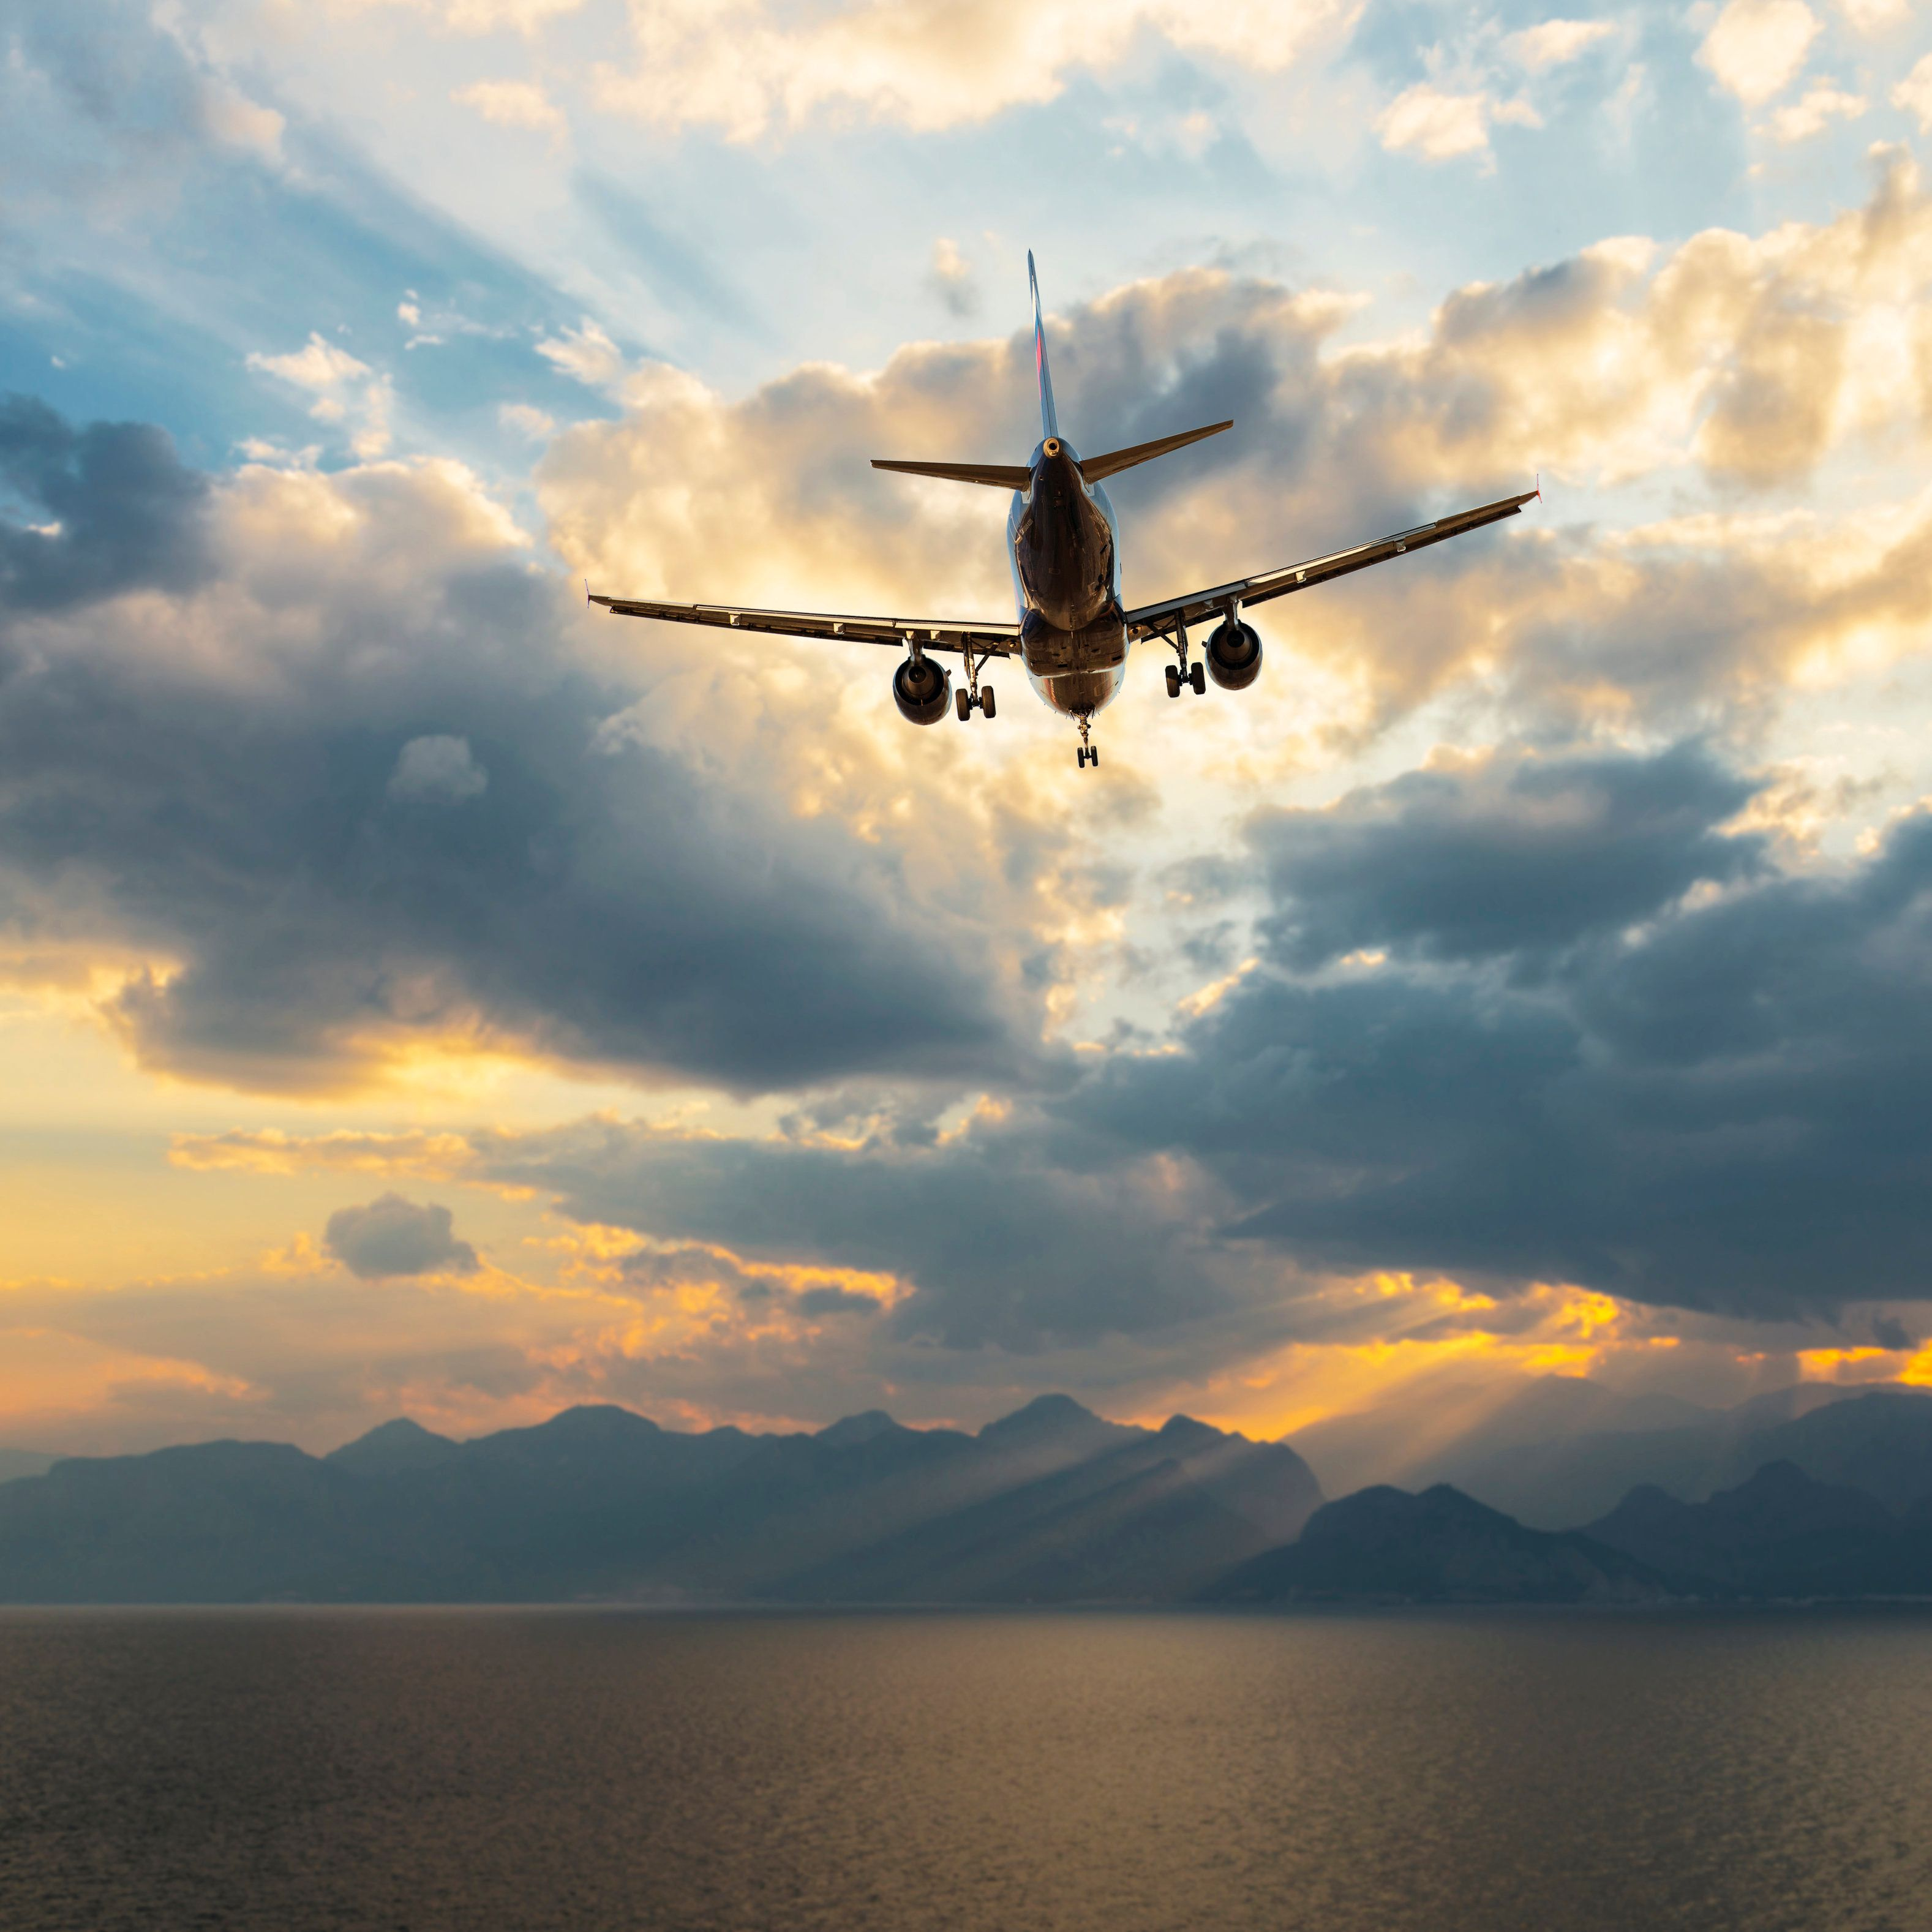 Airplane taking off over sea at dawn, near Antalya, Turkey.